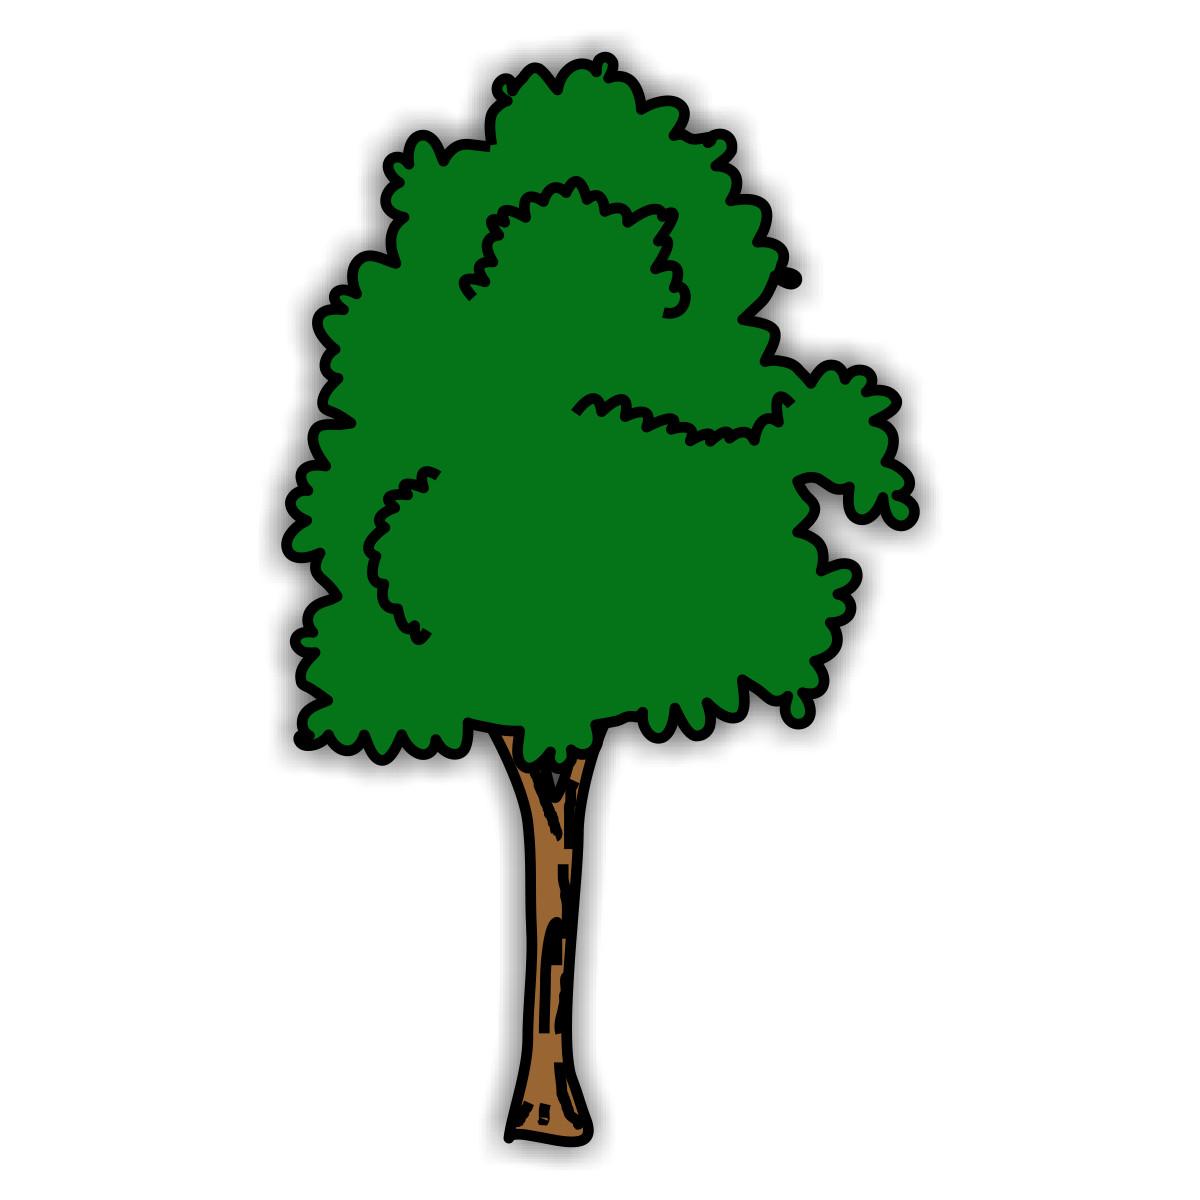 Bilder Baum Blätter.